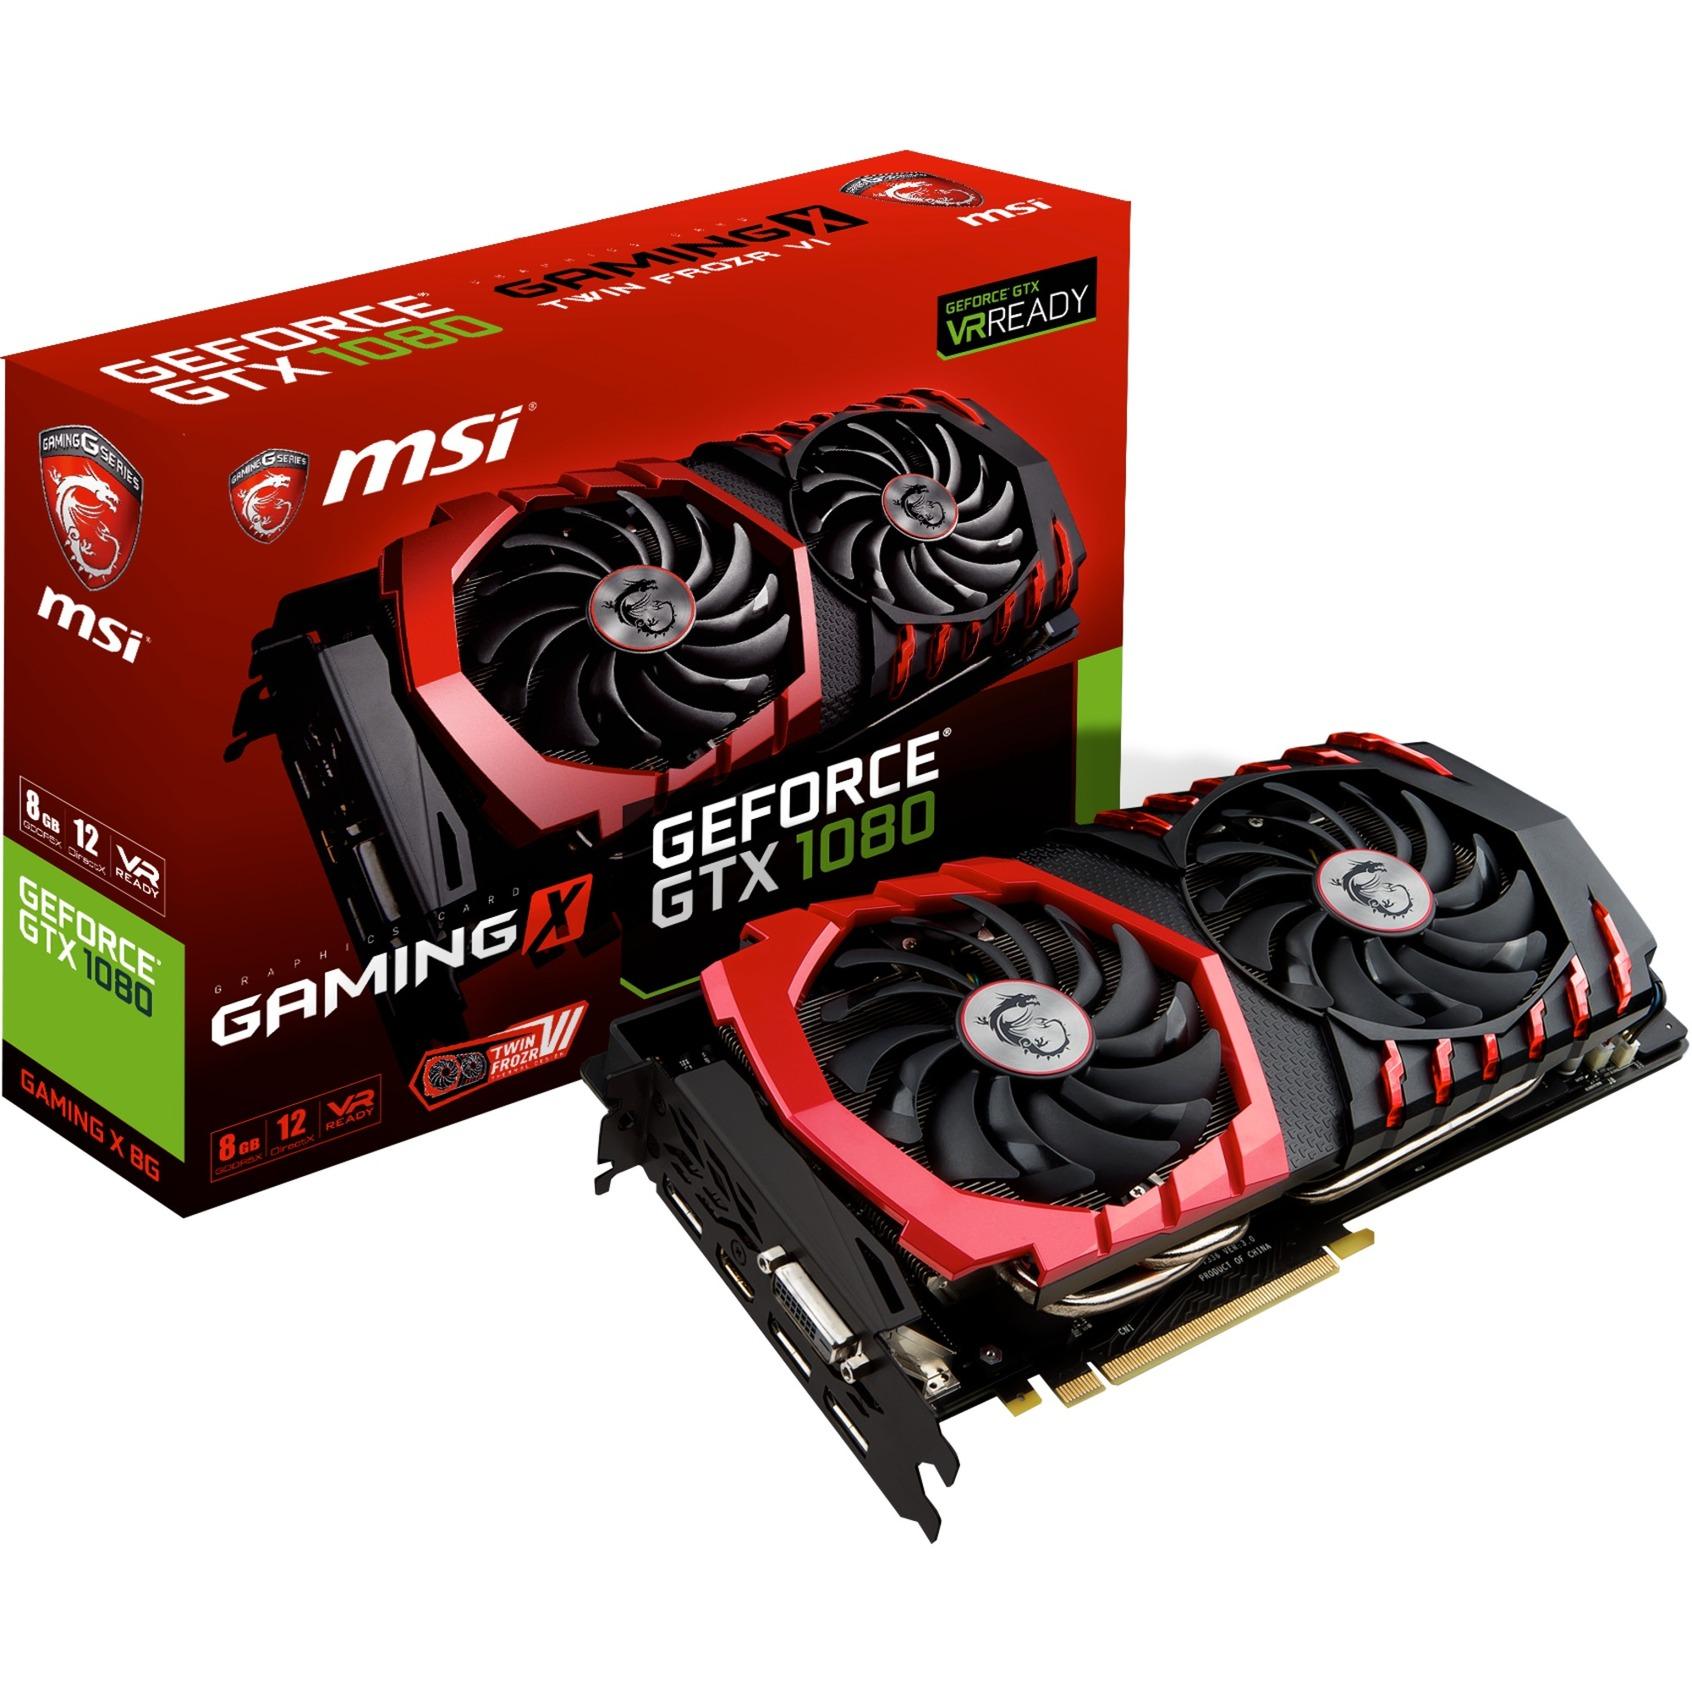 GeForce GTX 1080 Gaming X 8G, Carte graphique